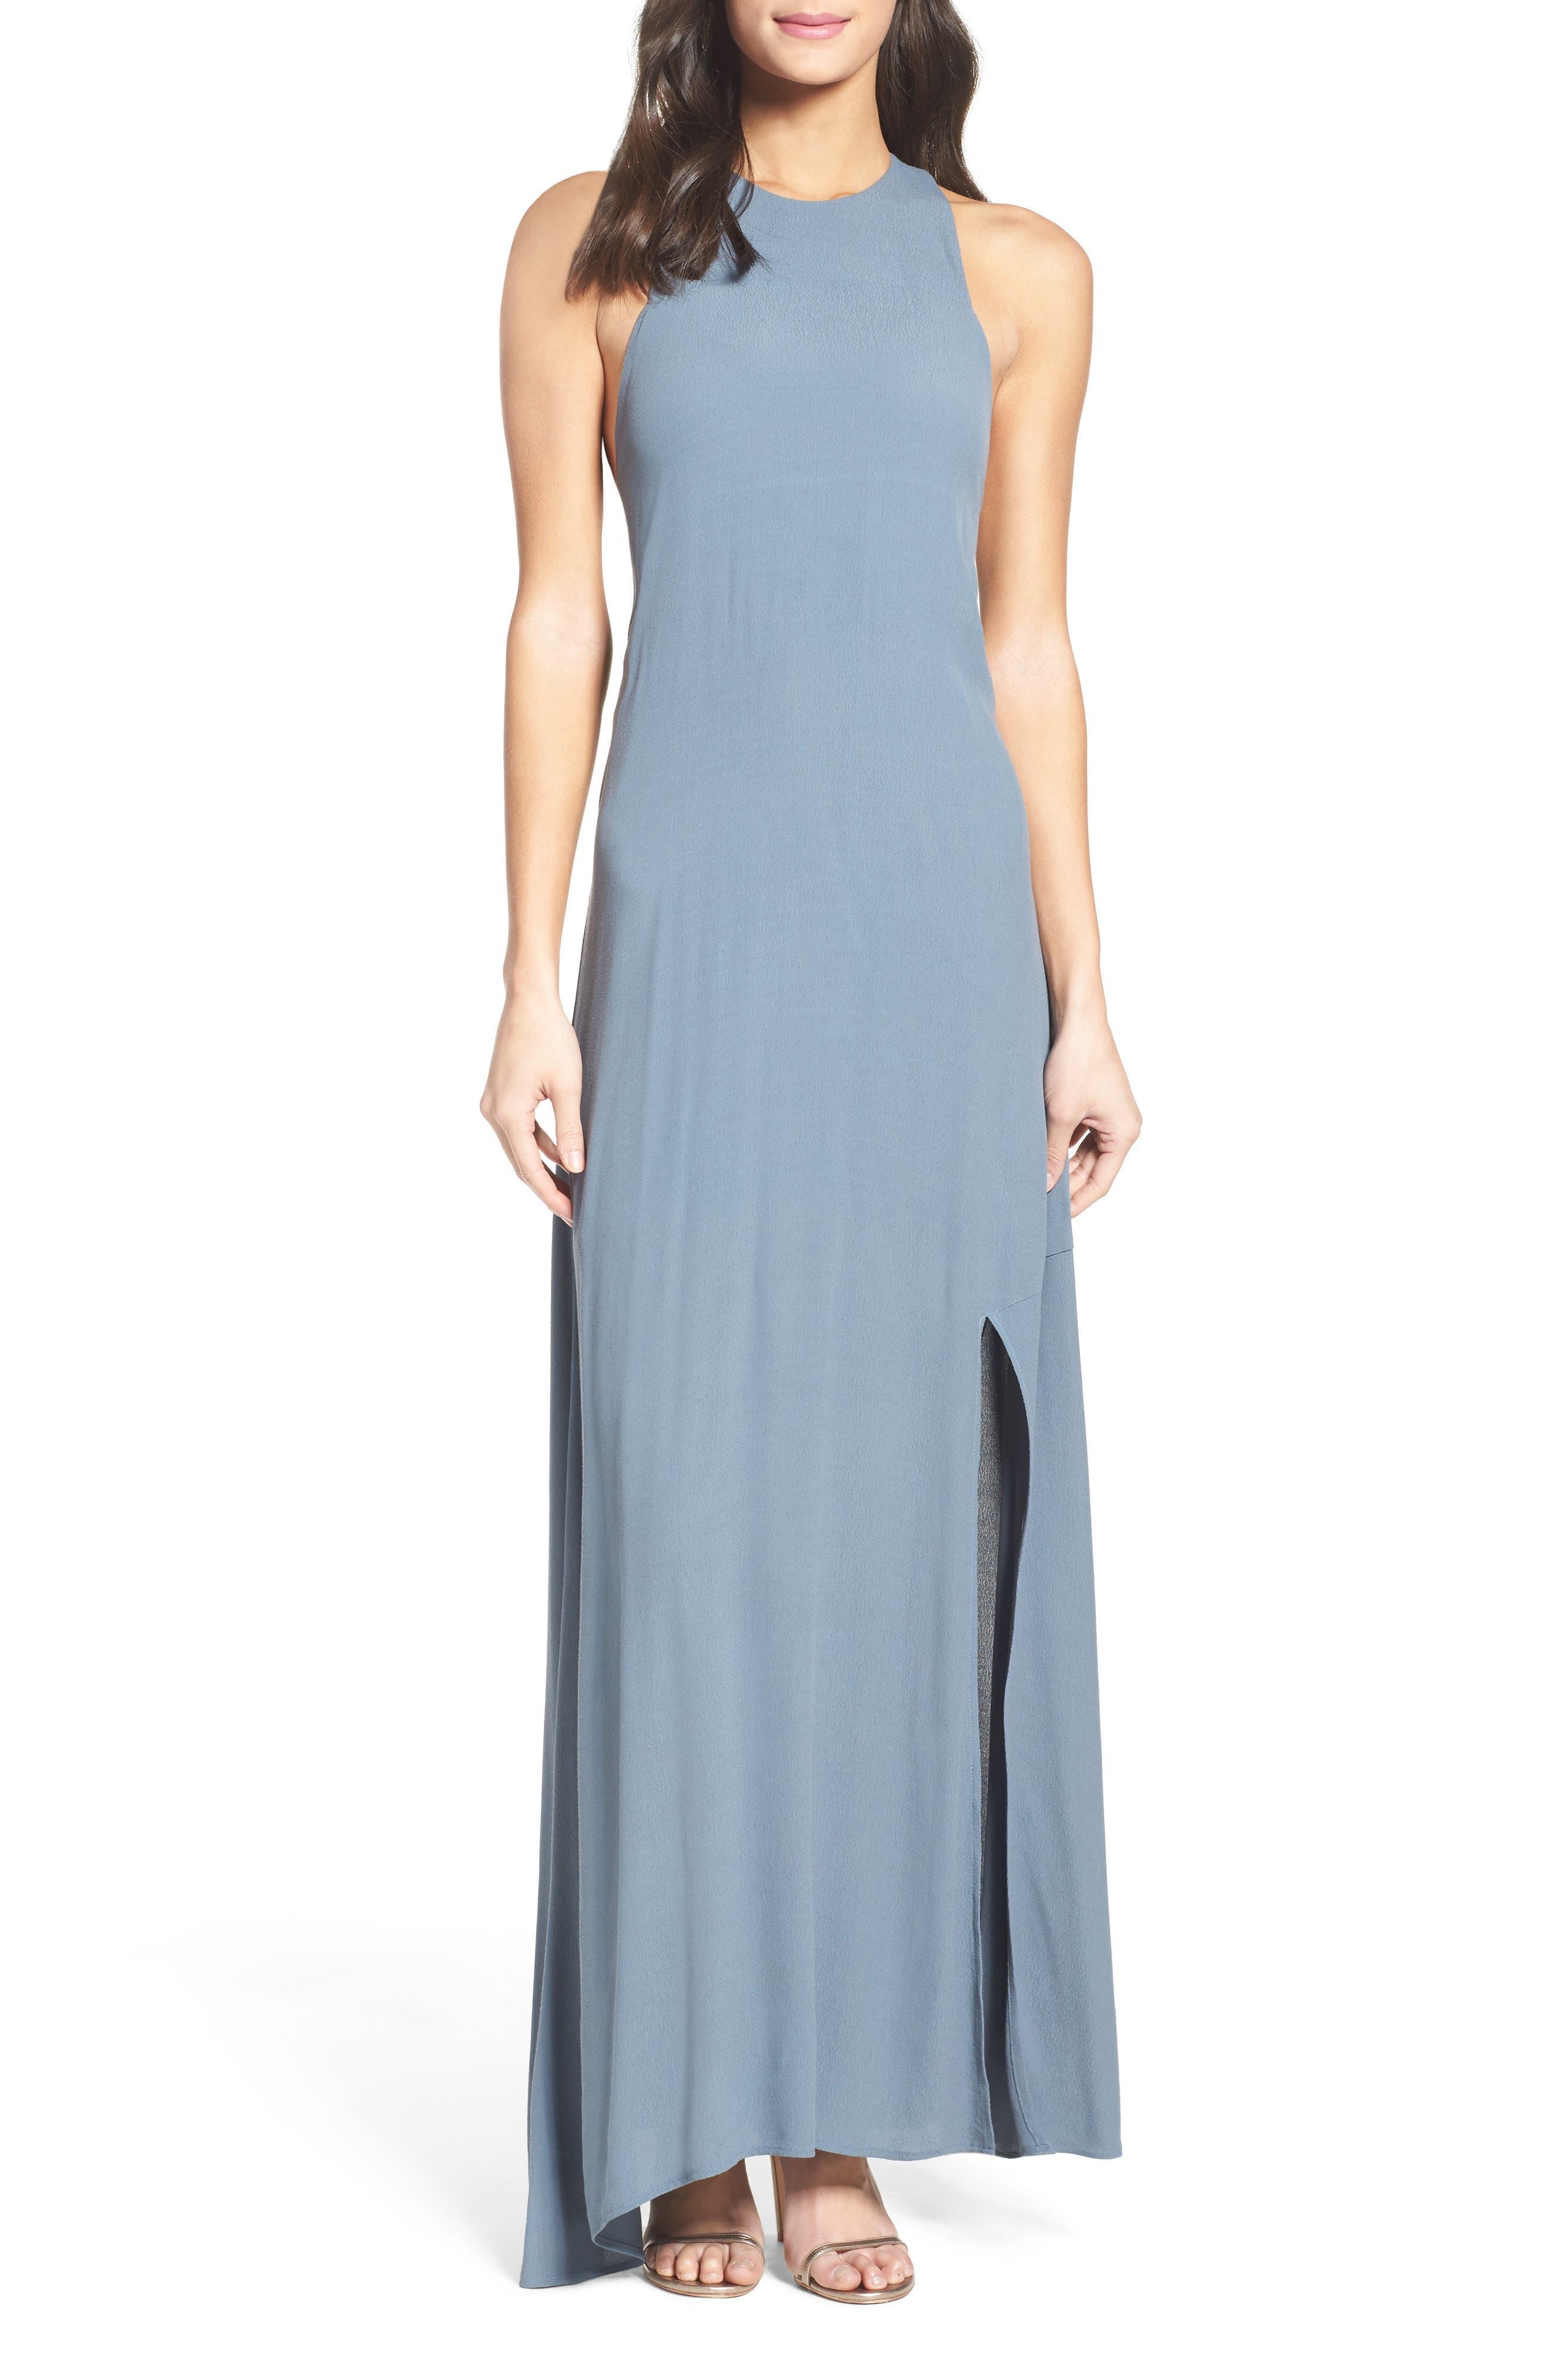 Alternate Image 1 Selected - Roe + May Bordeaux Crepe Dress